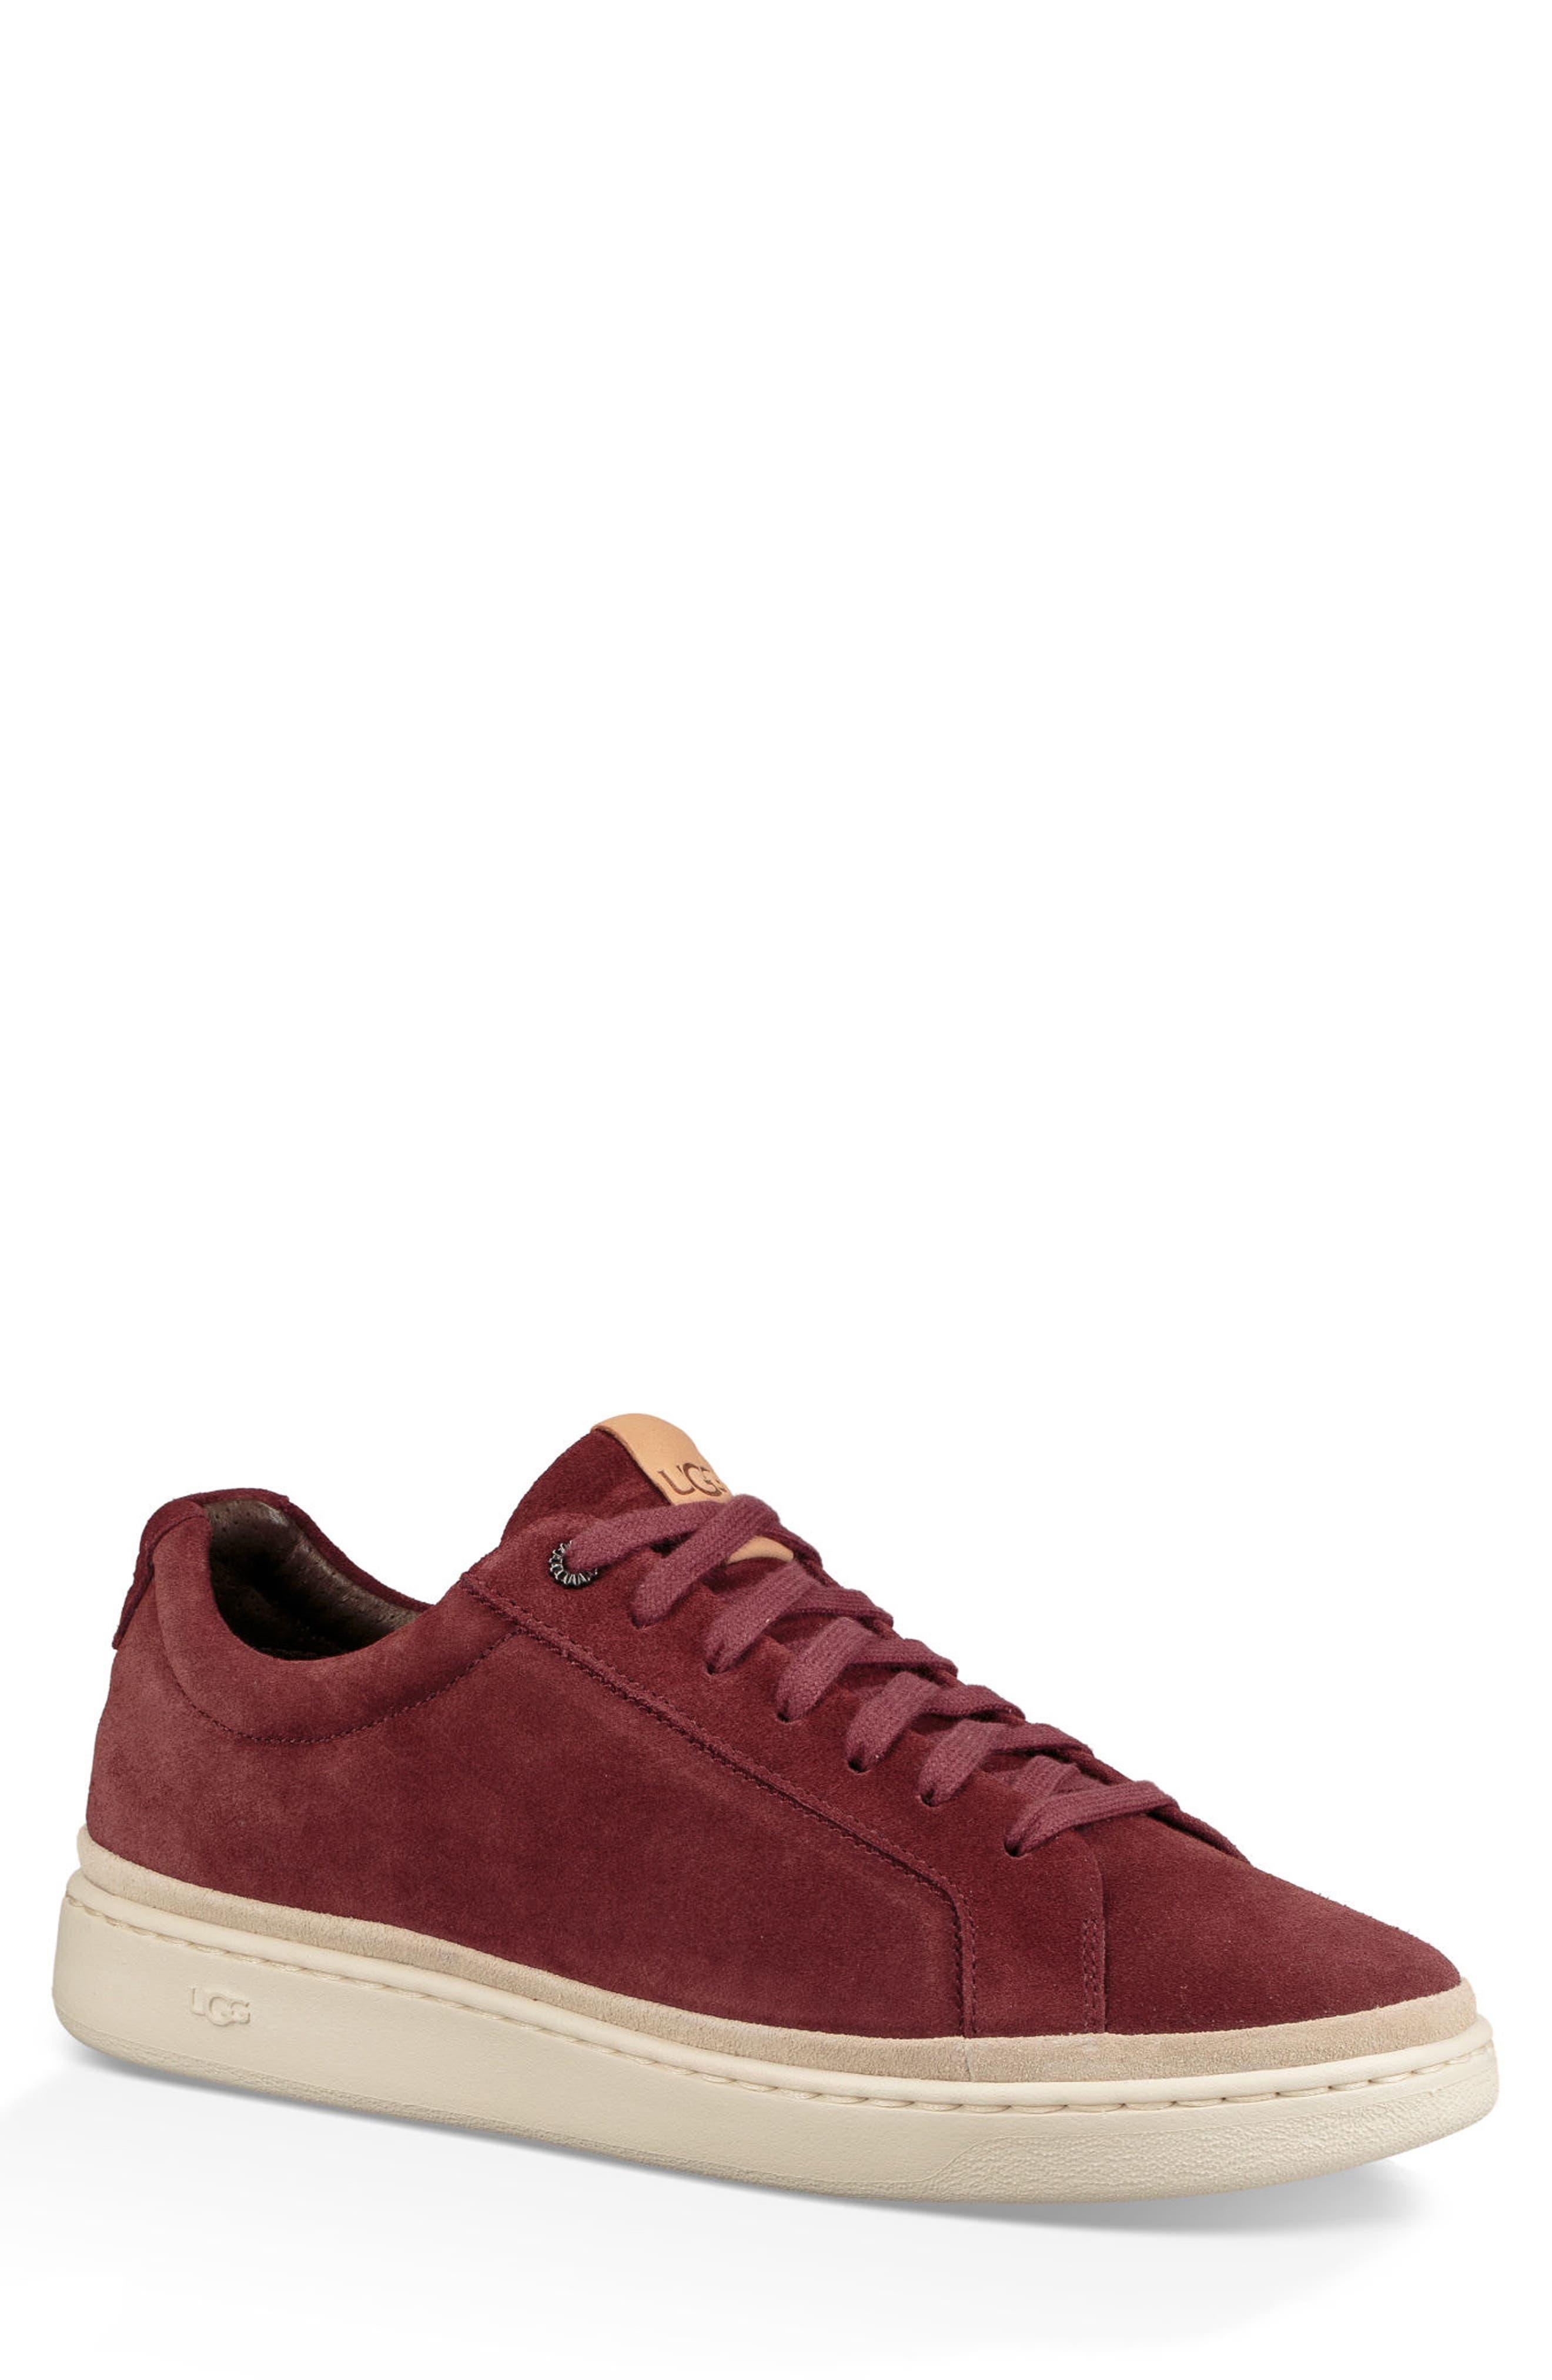 Brecken Sneaker,                         Main,                         color, Pinot Noir Leather